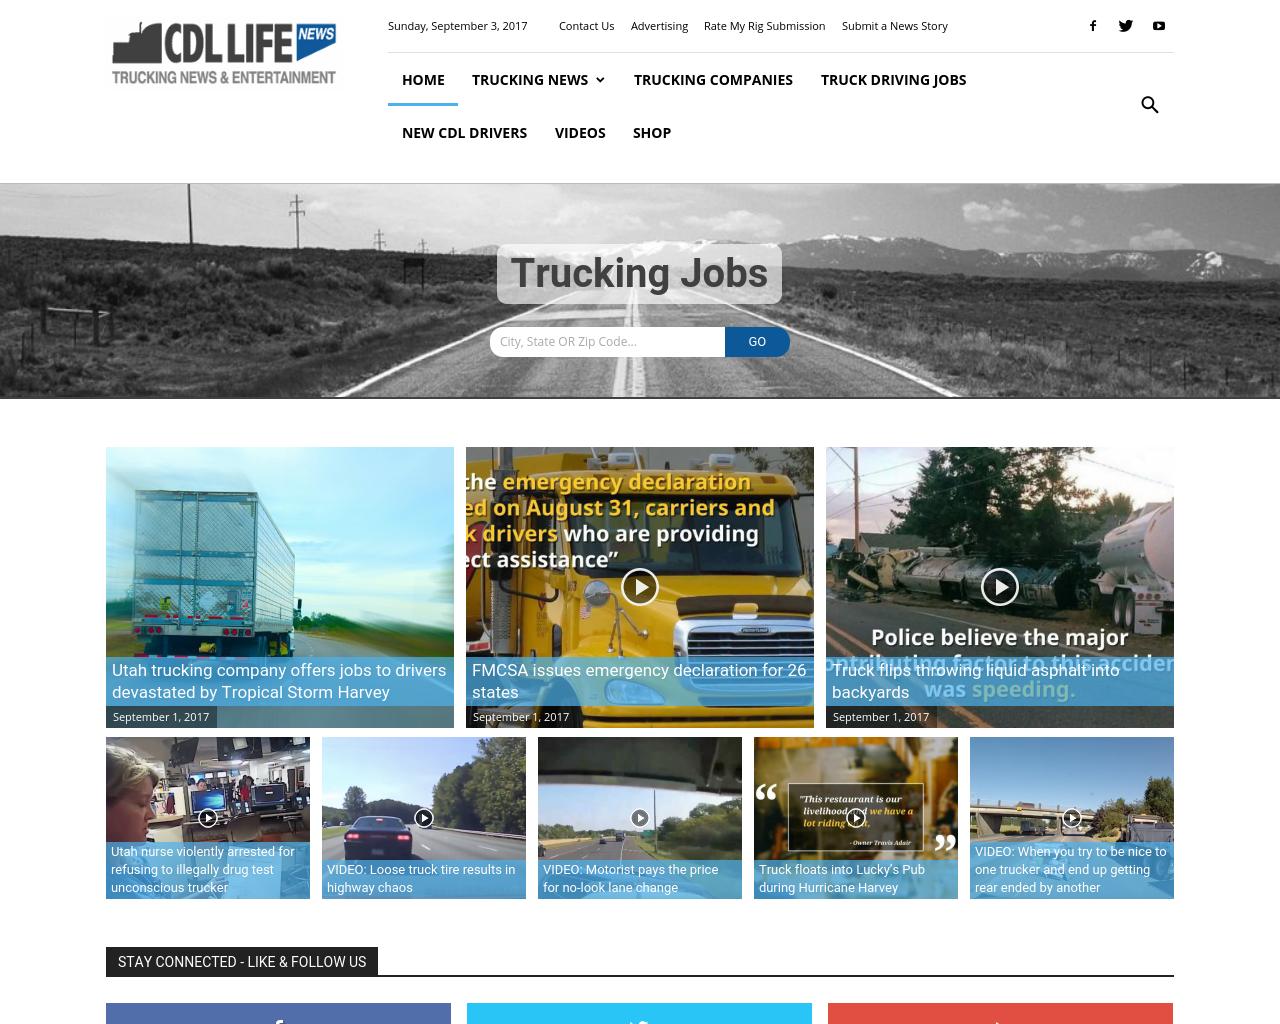 CDLLife-News-Advertising-Reviews-Pricing